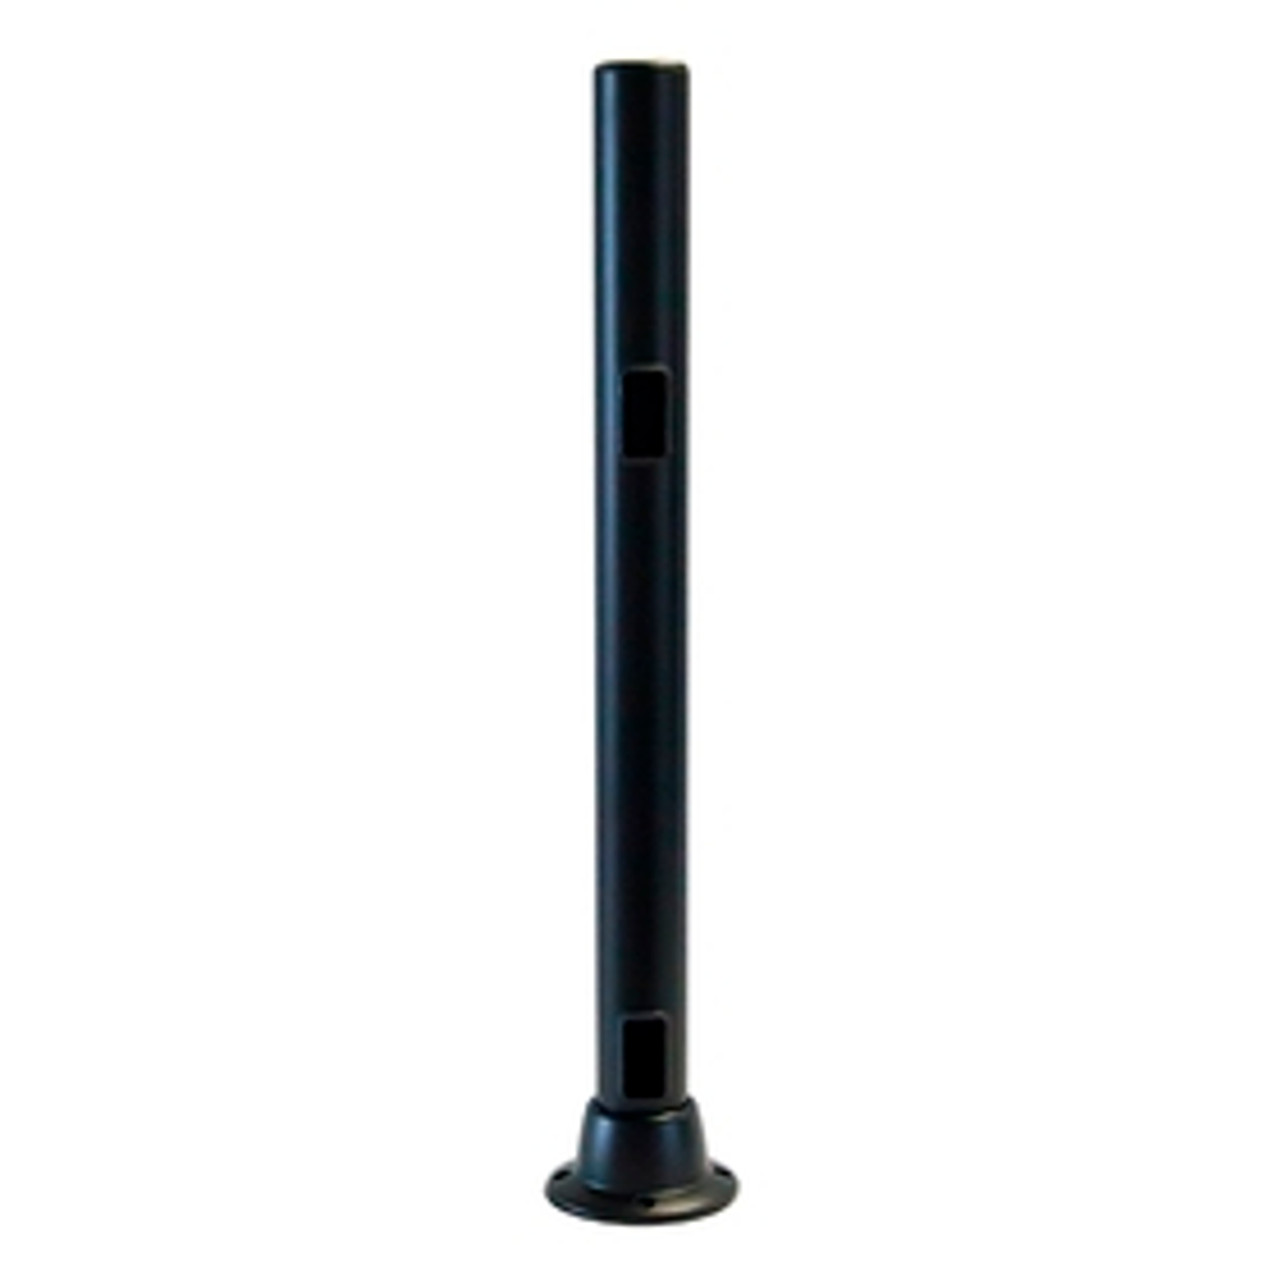 POS Grommet Mount Base 16 inch Pole